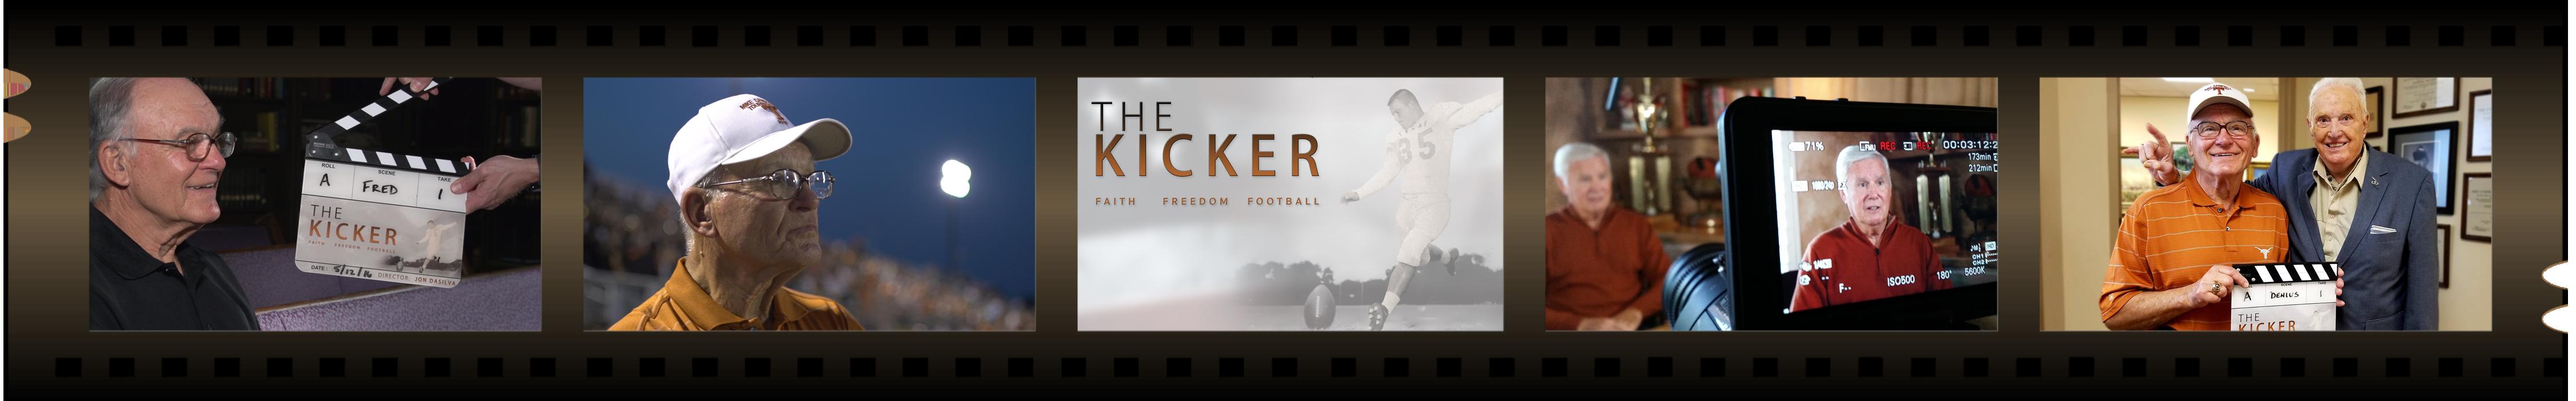 Kicker-Filmstrip